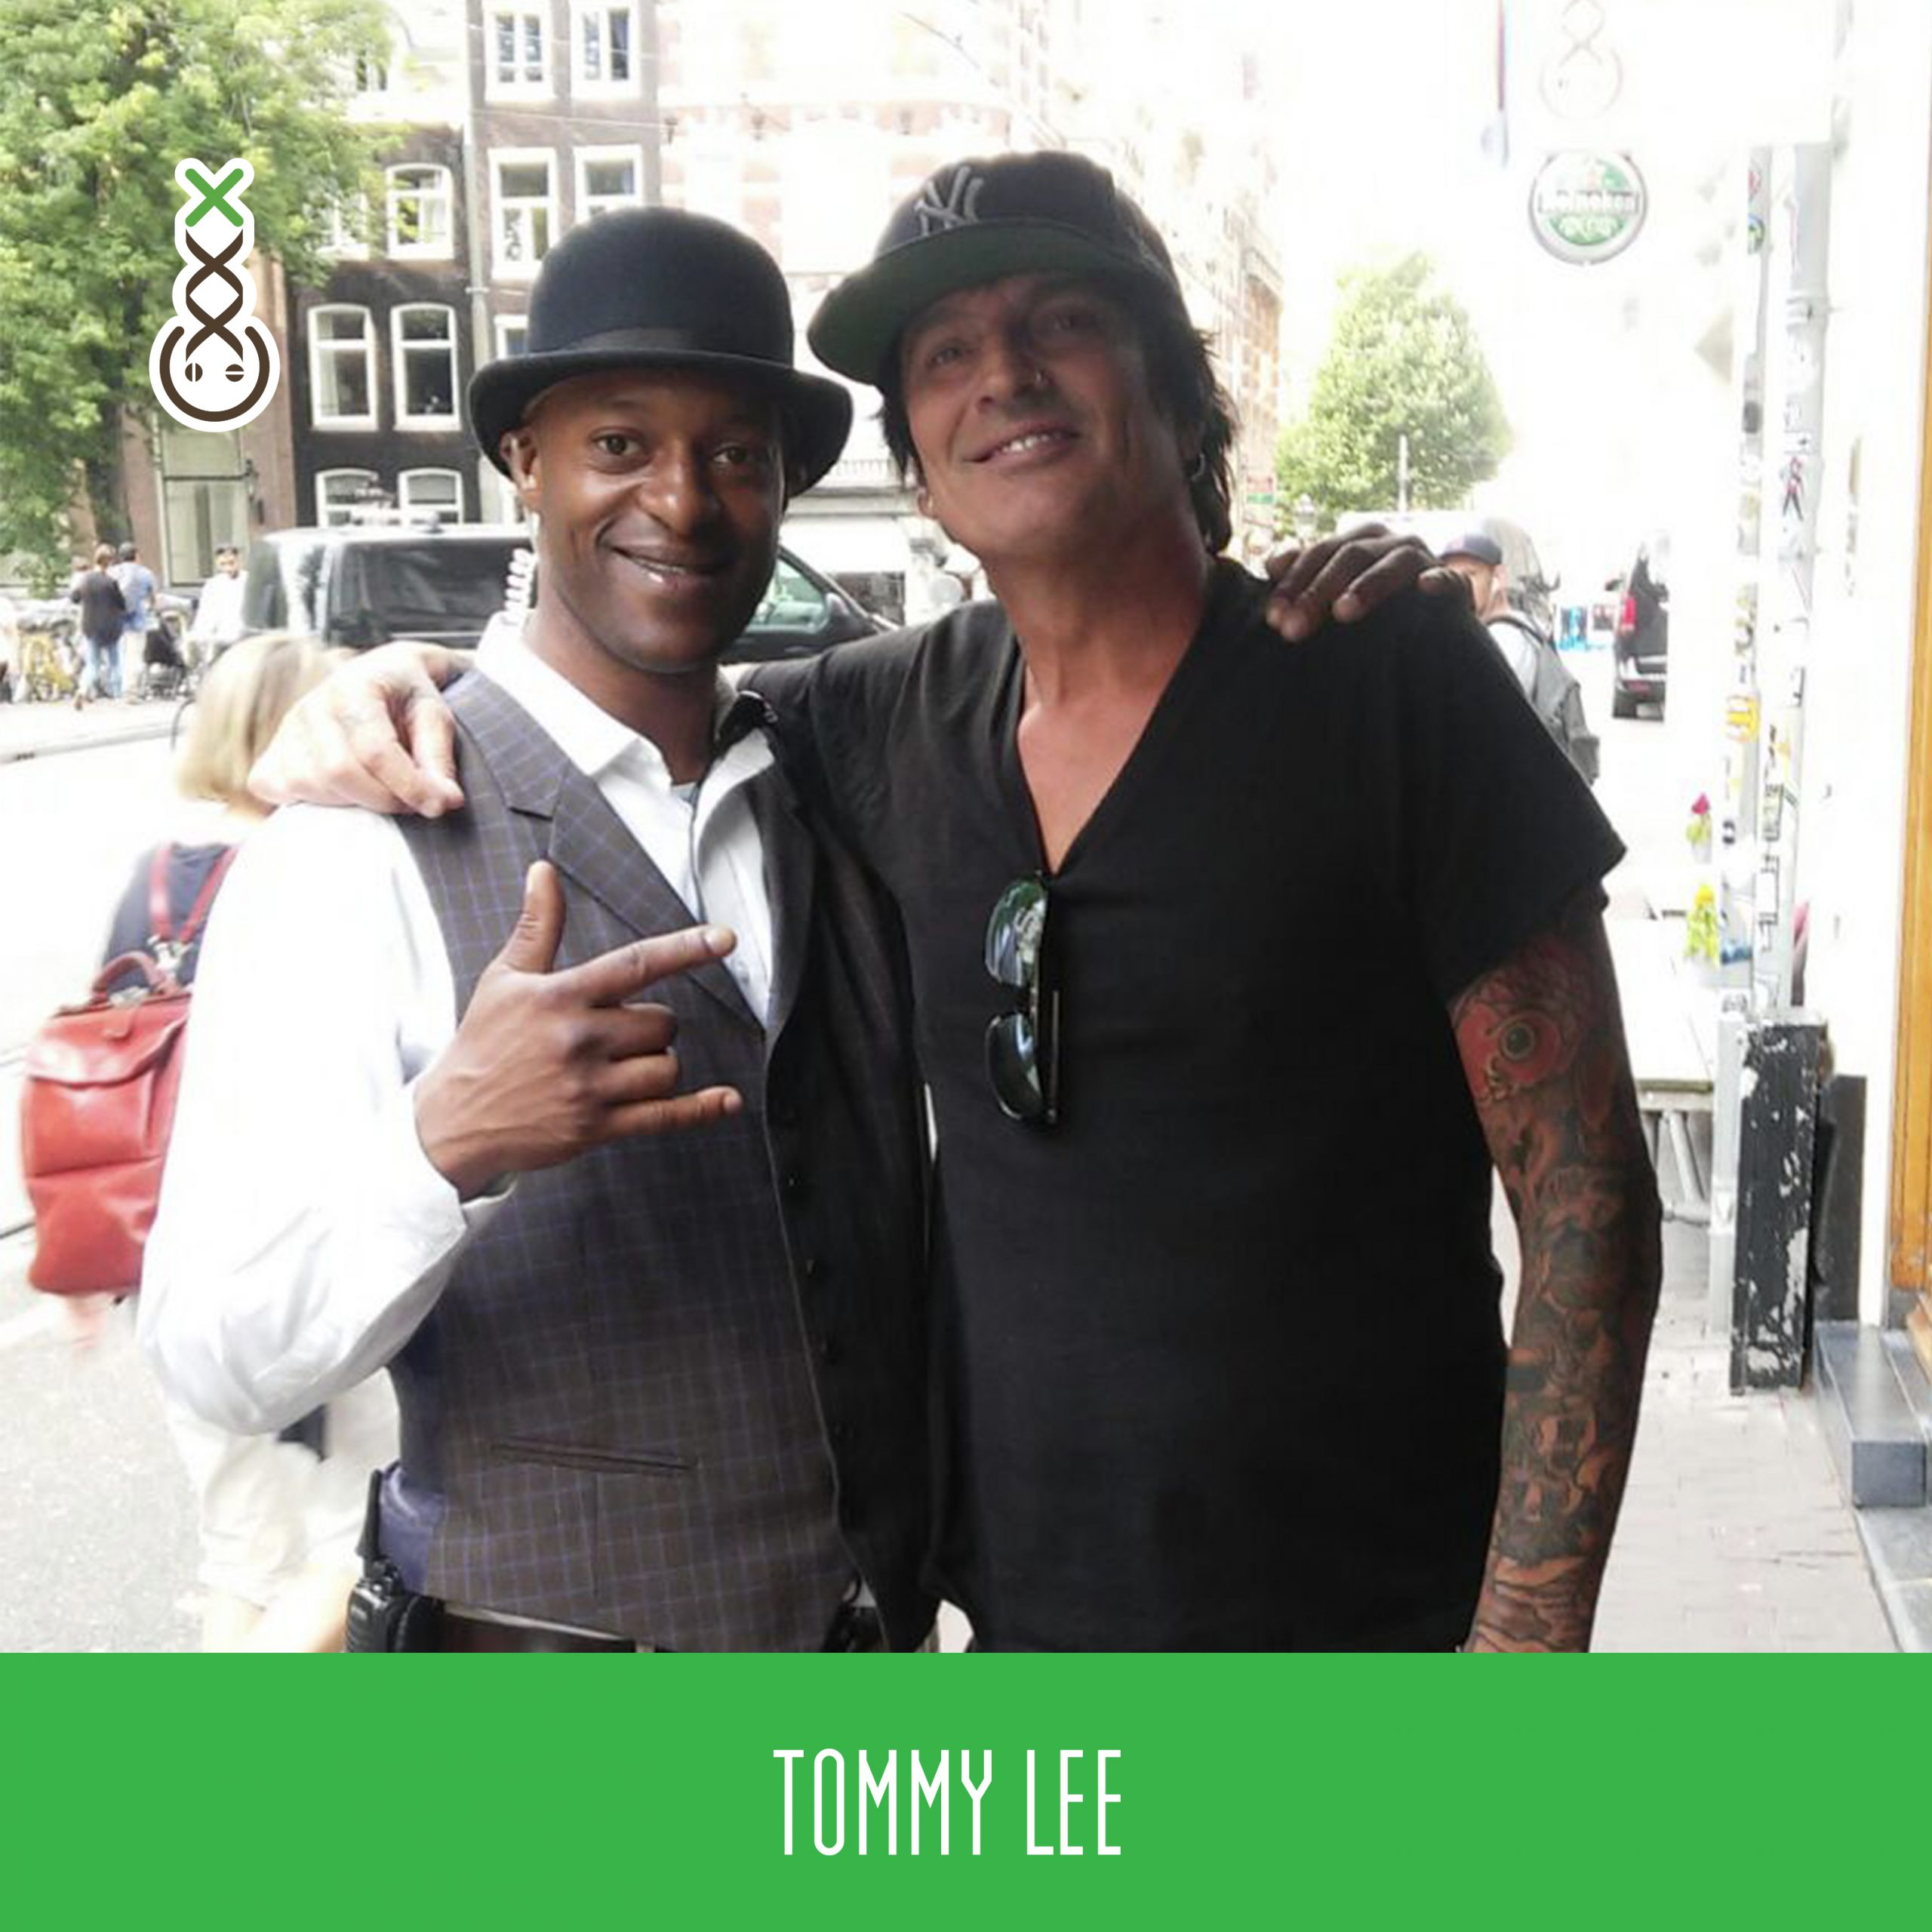 Tommy Lee @ Boerejongens coffeeshop celebrity